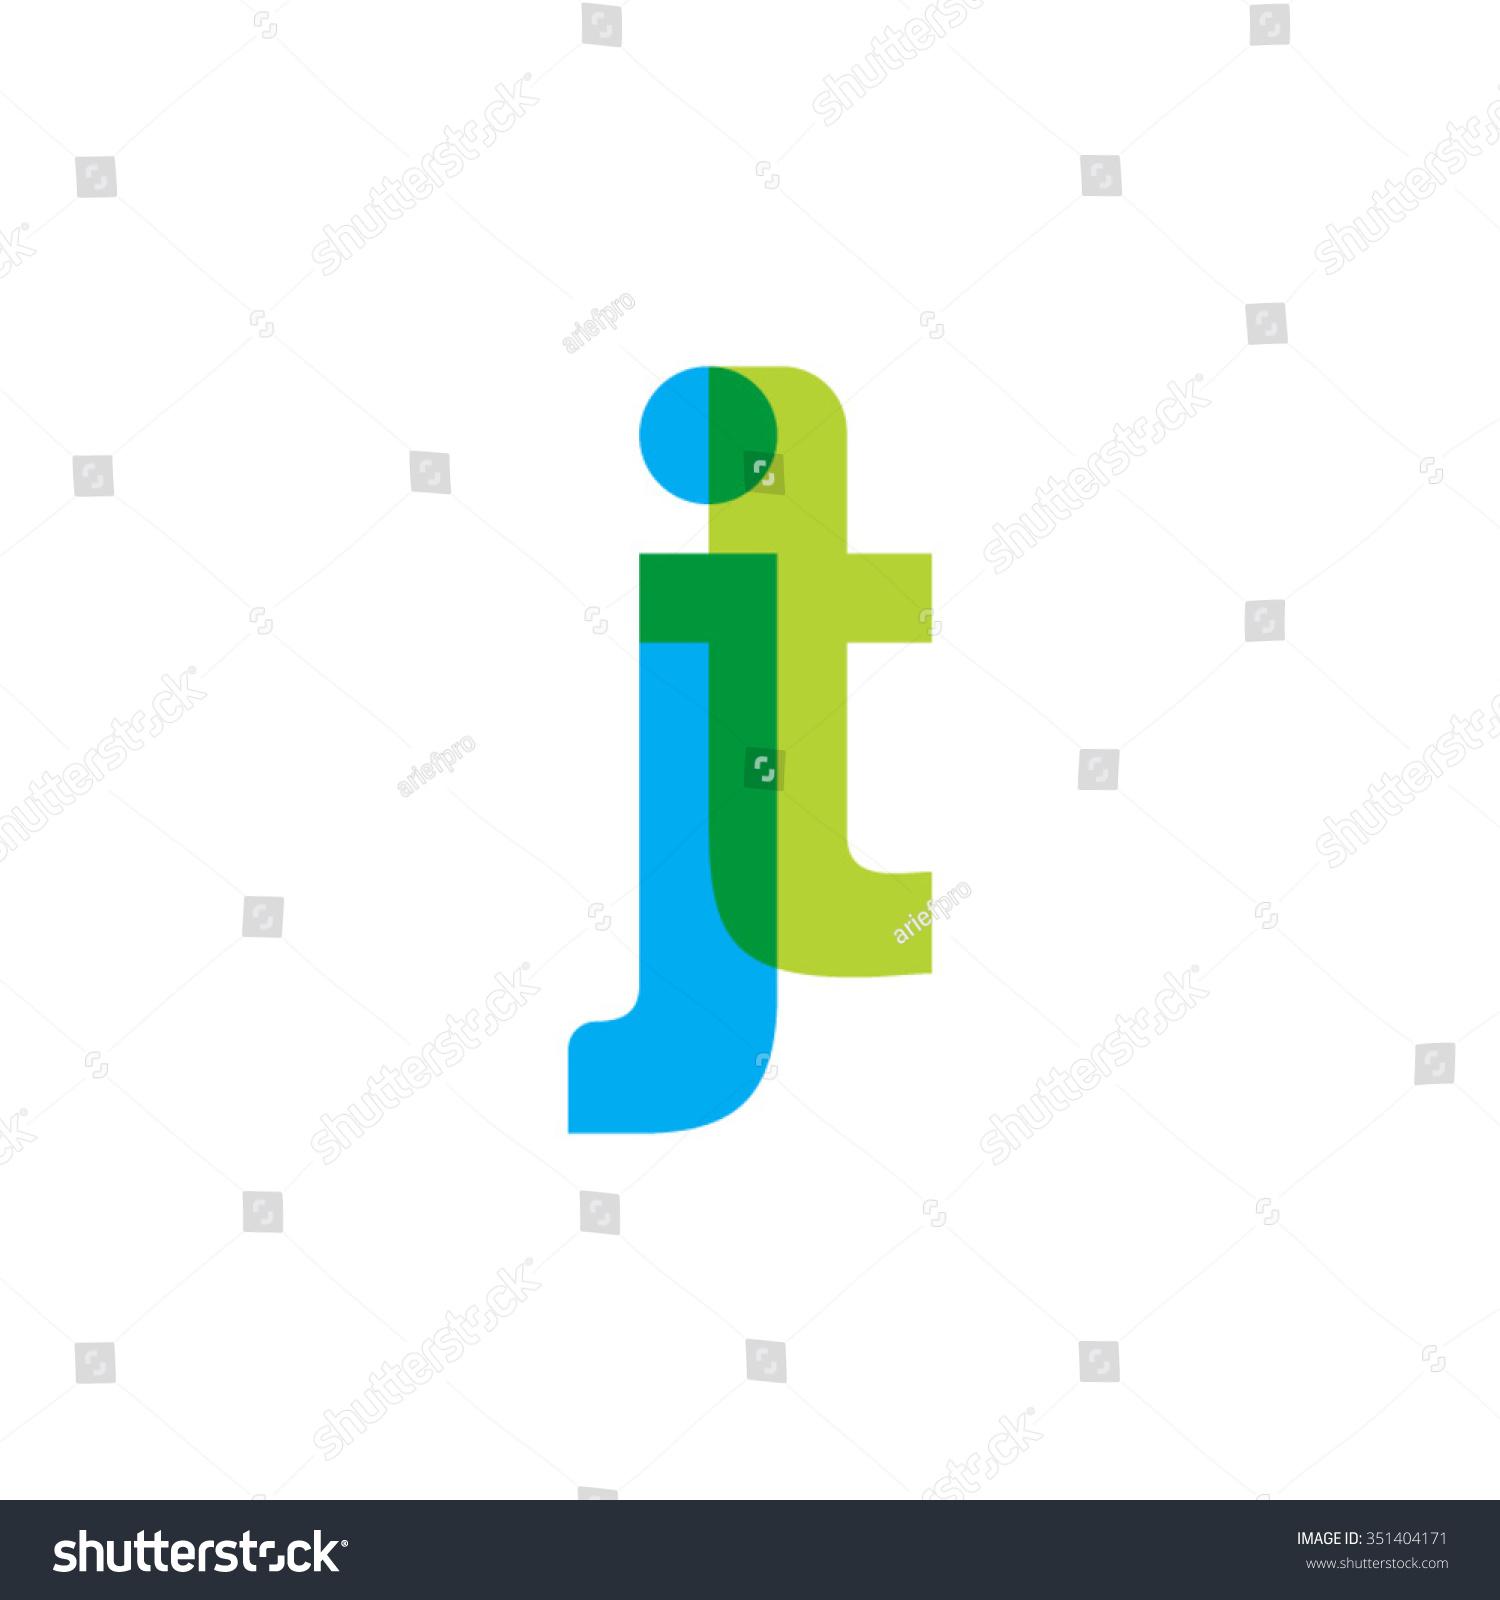 Tj initial luxury ornament monogram logo stock vector - Lowercase Jt Logo Blue Green Overlap Transparent Logo